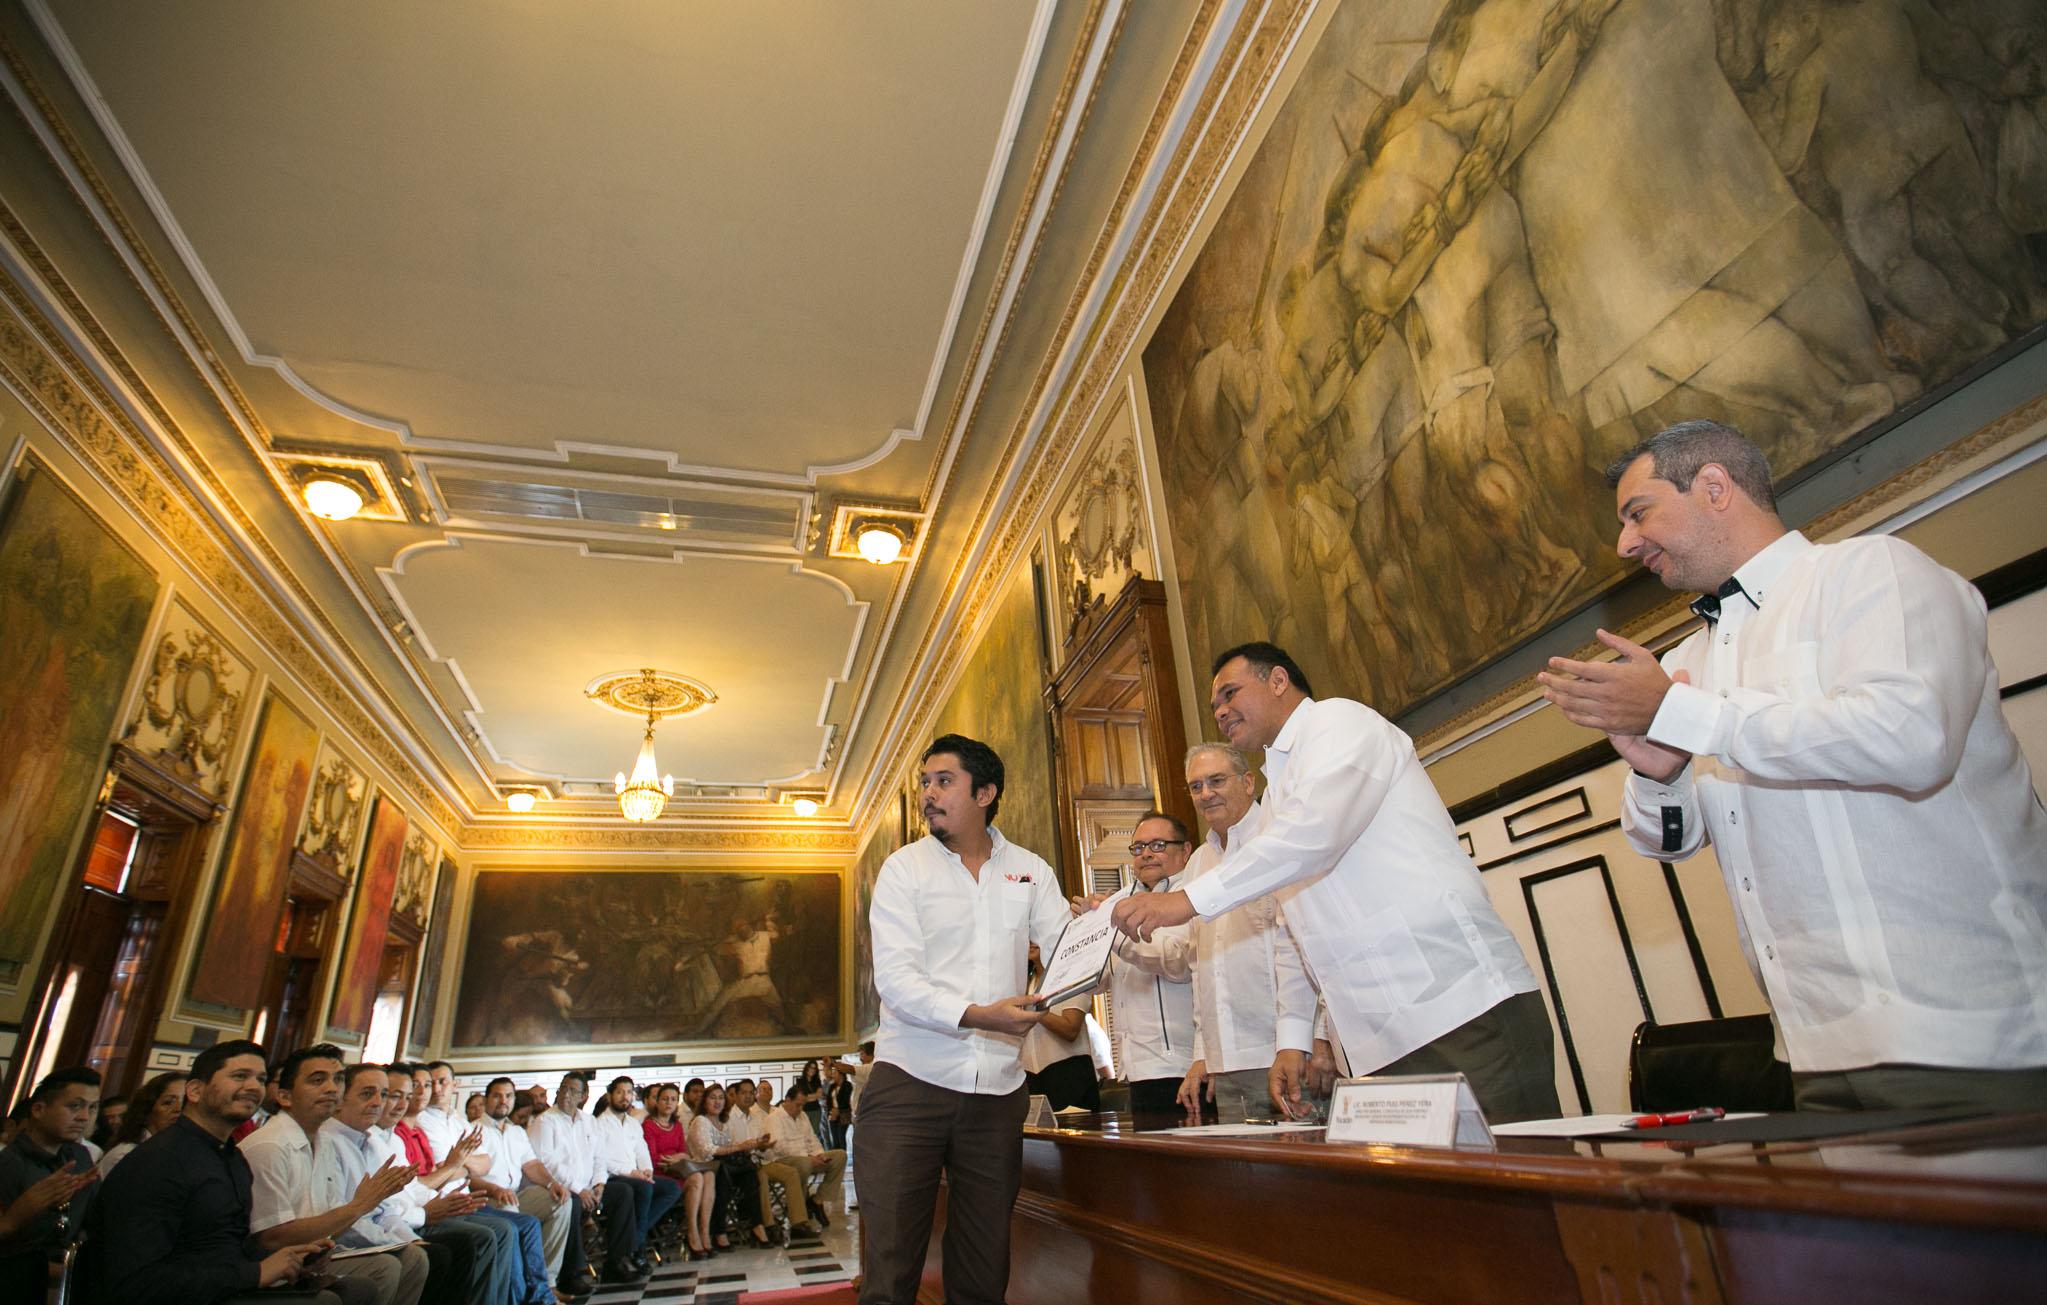 Firmas yucatecas reciben subsidios del programa Prosoft 2015